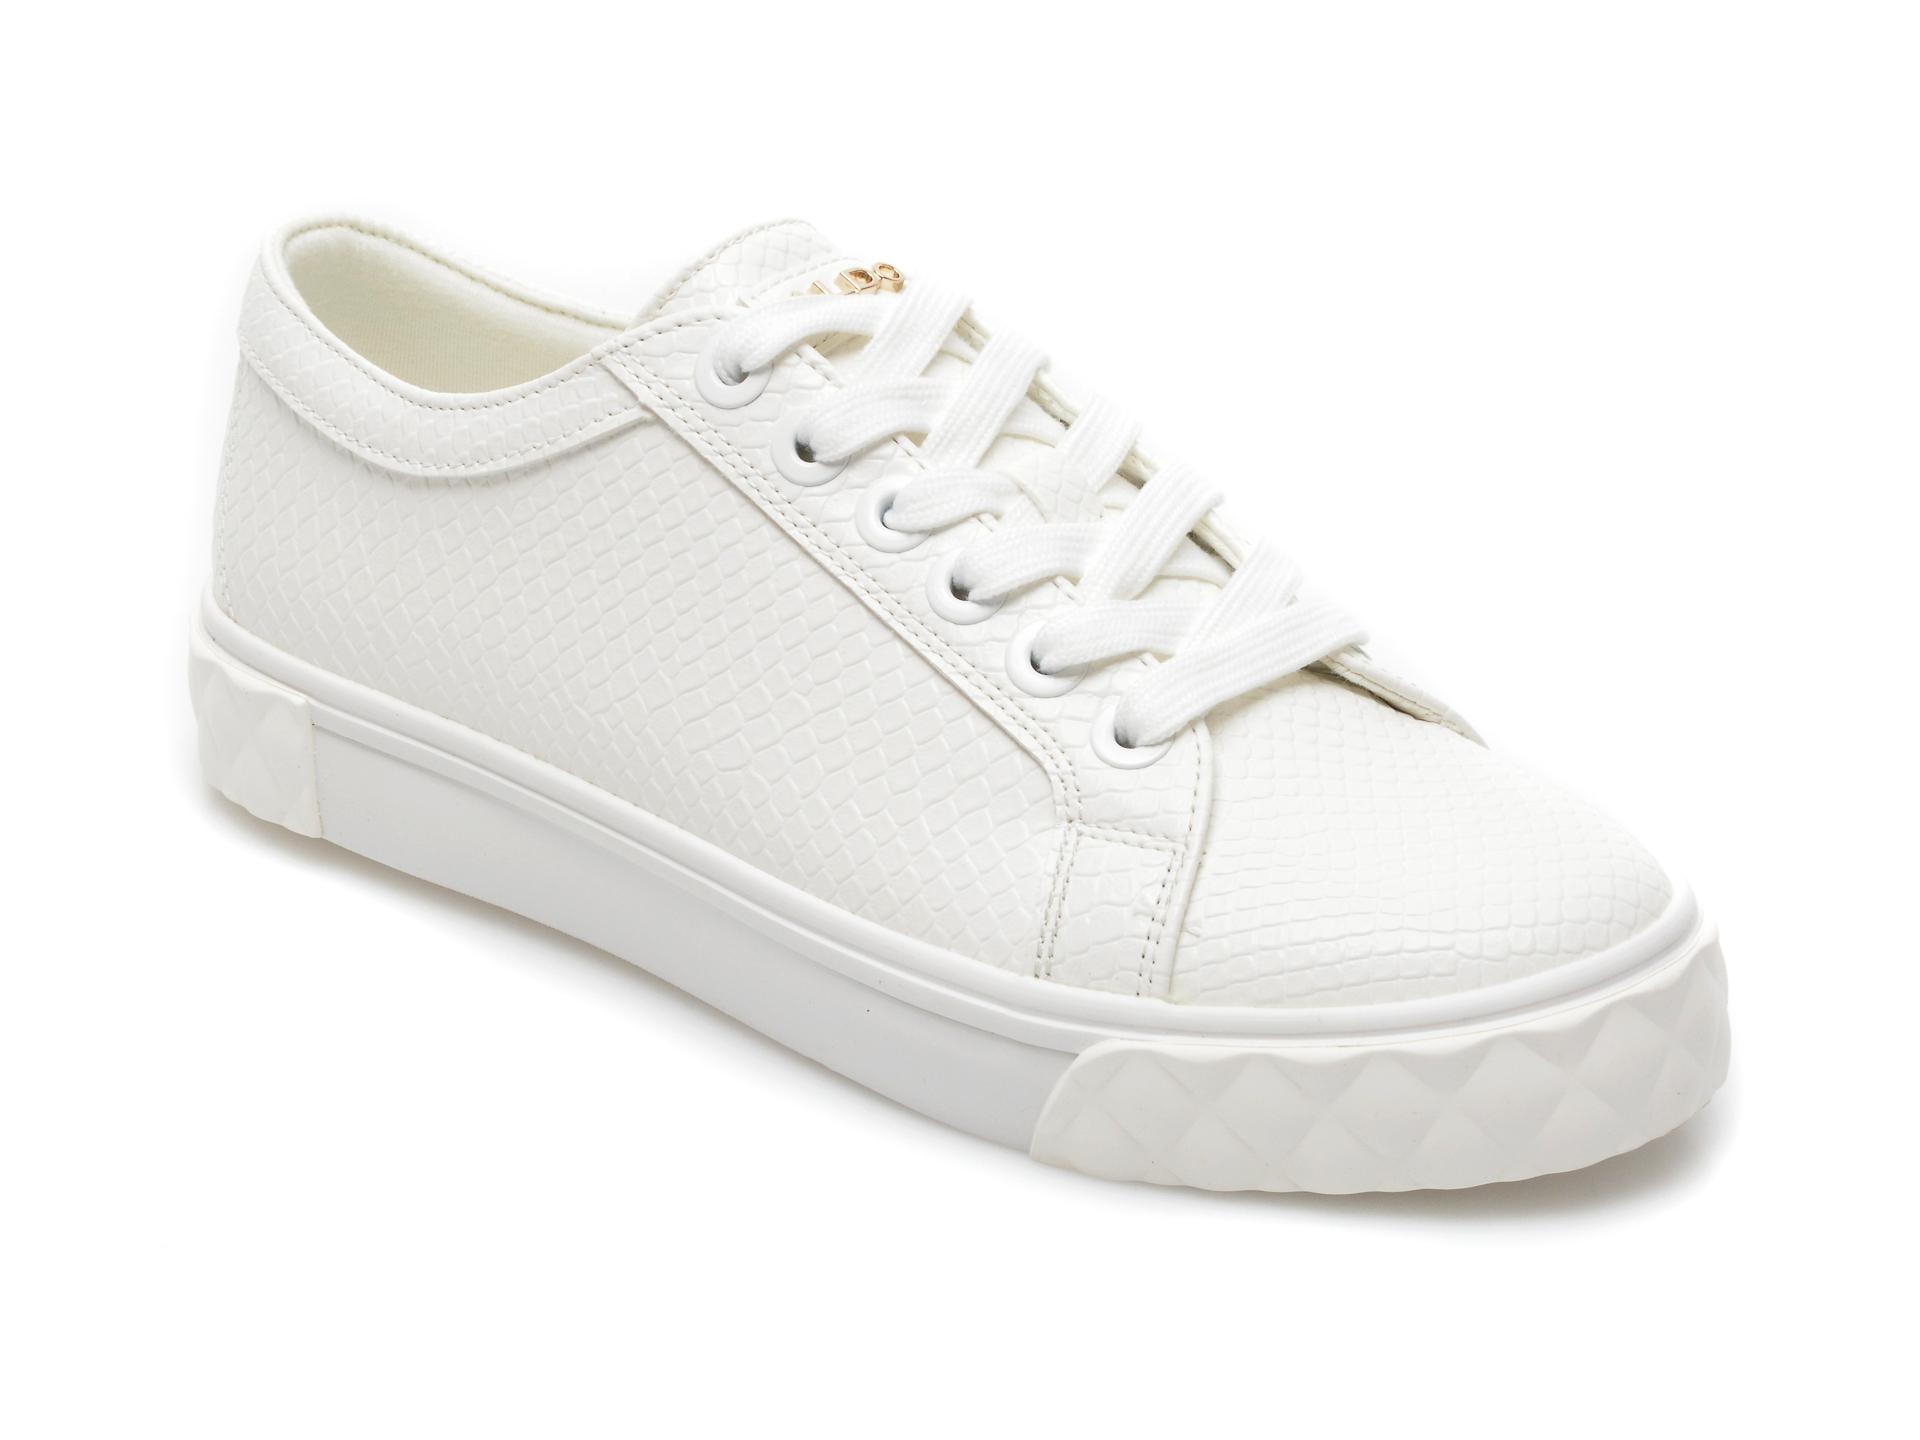 Pantofi sport ALDO albi, Kaendandra100, din piele ecologica imagine 2021 Aldo